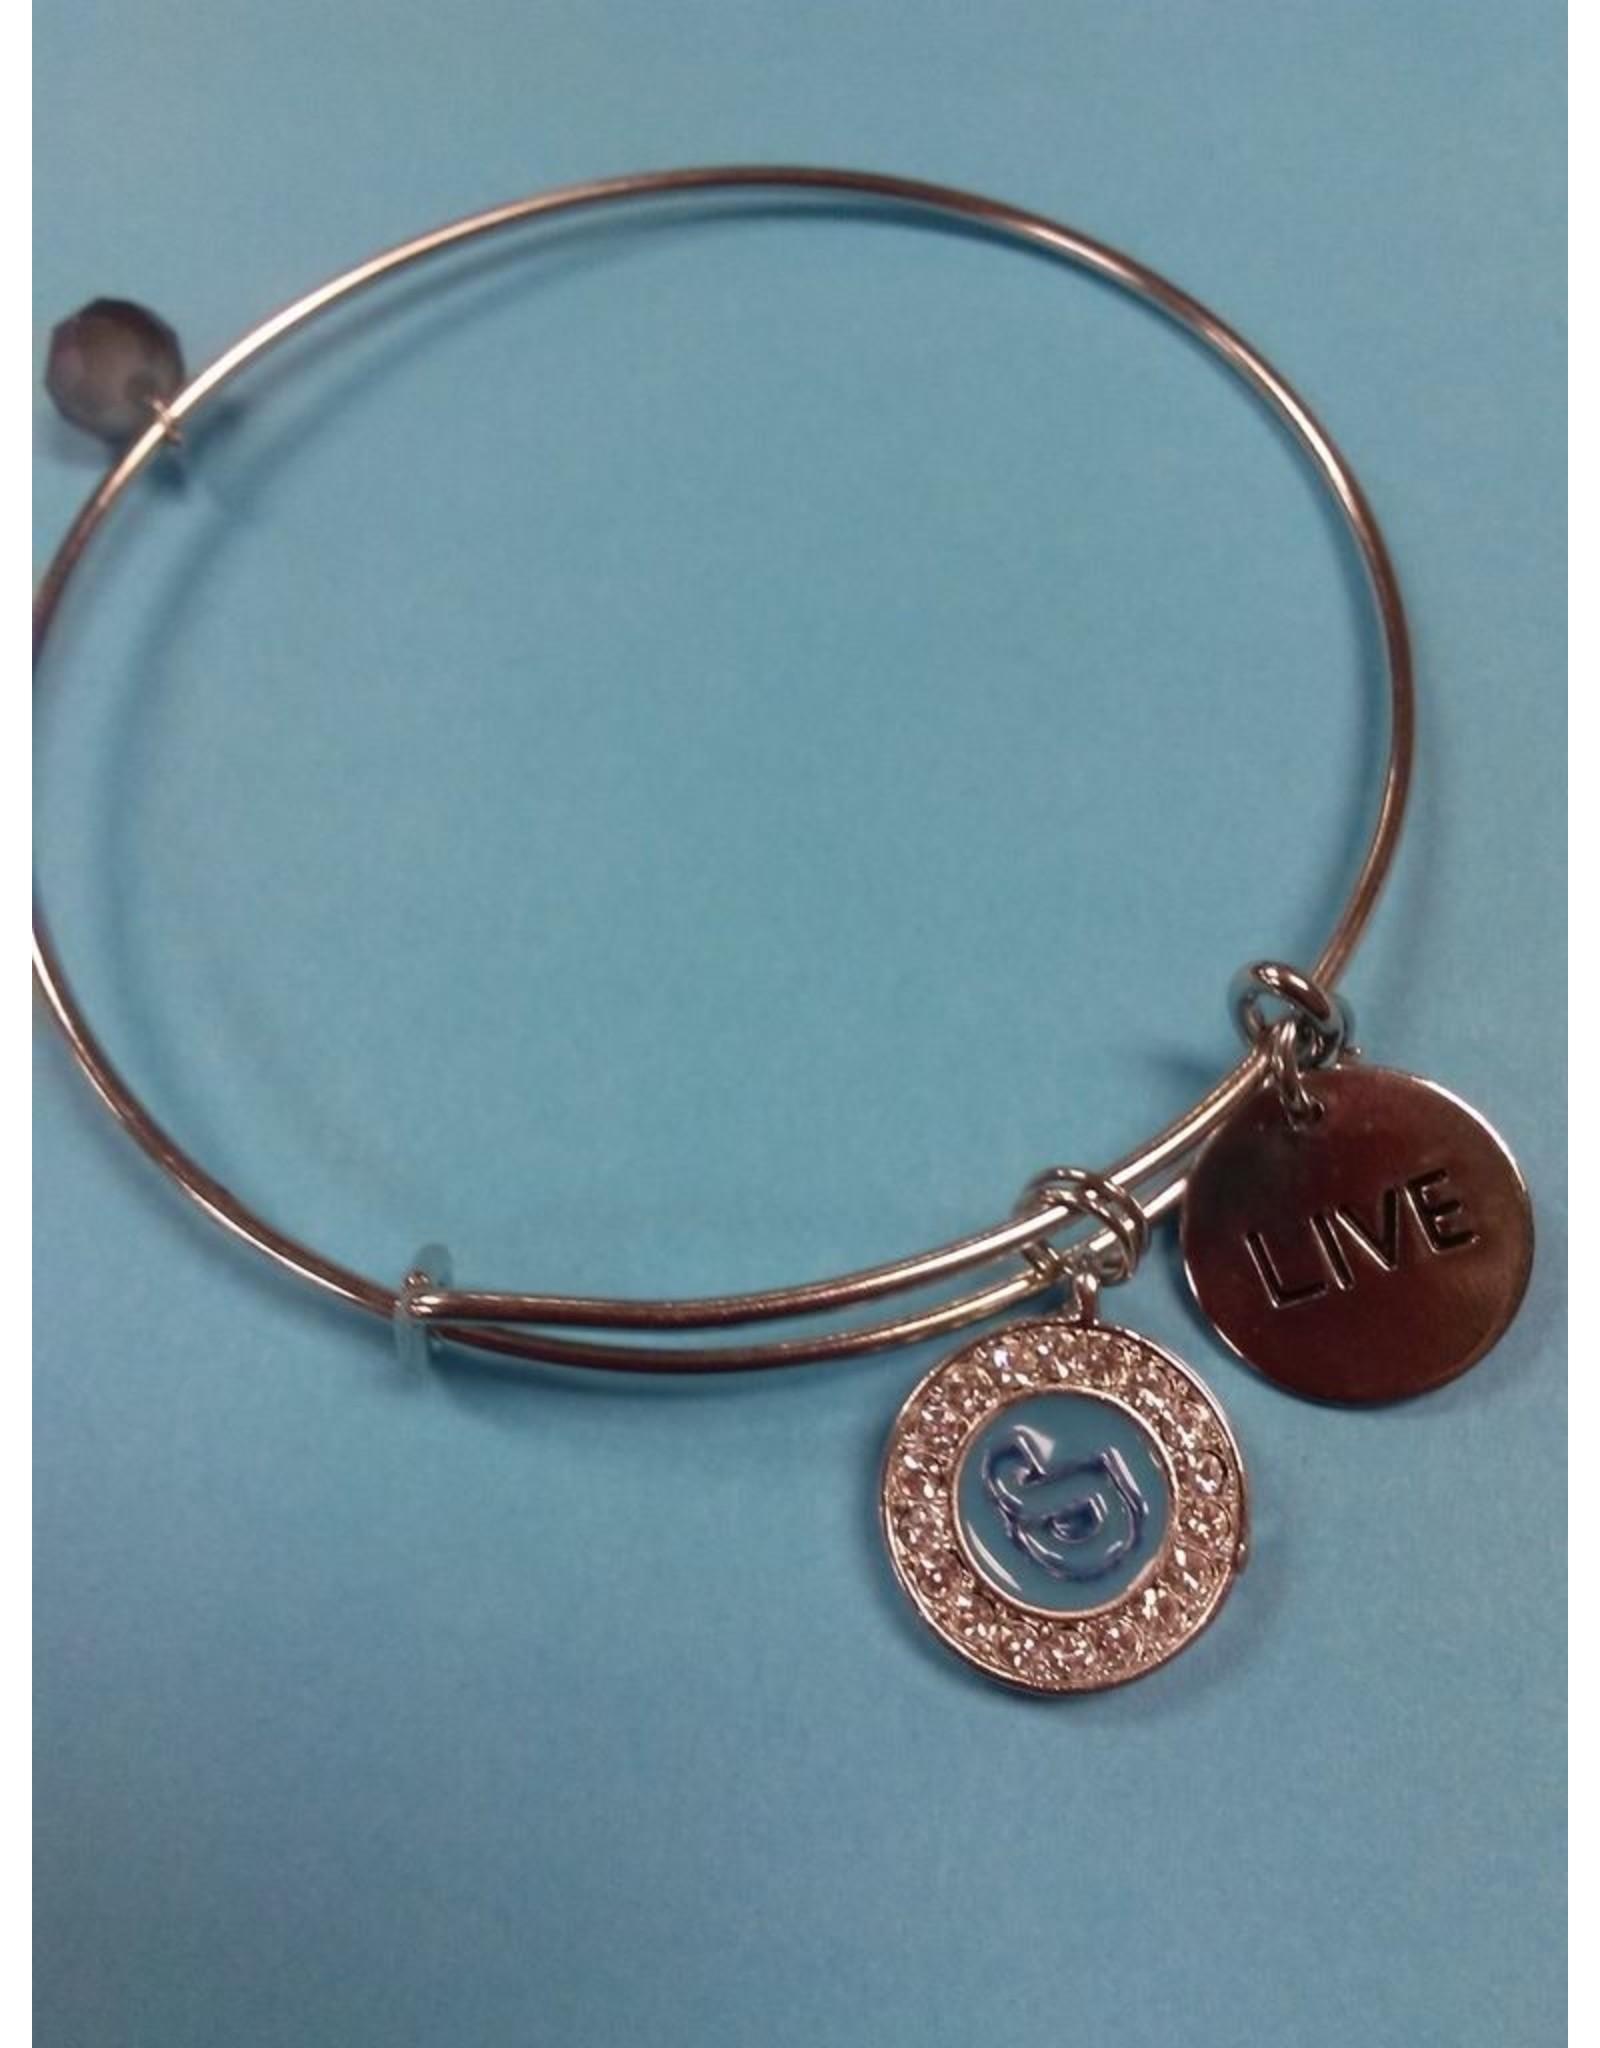 NON-UNIFORM JD Charm Bracelet, Sterling Silver